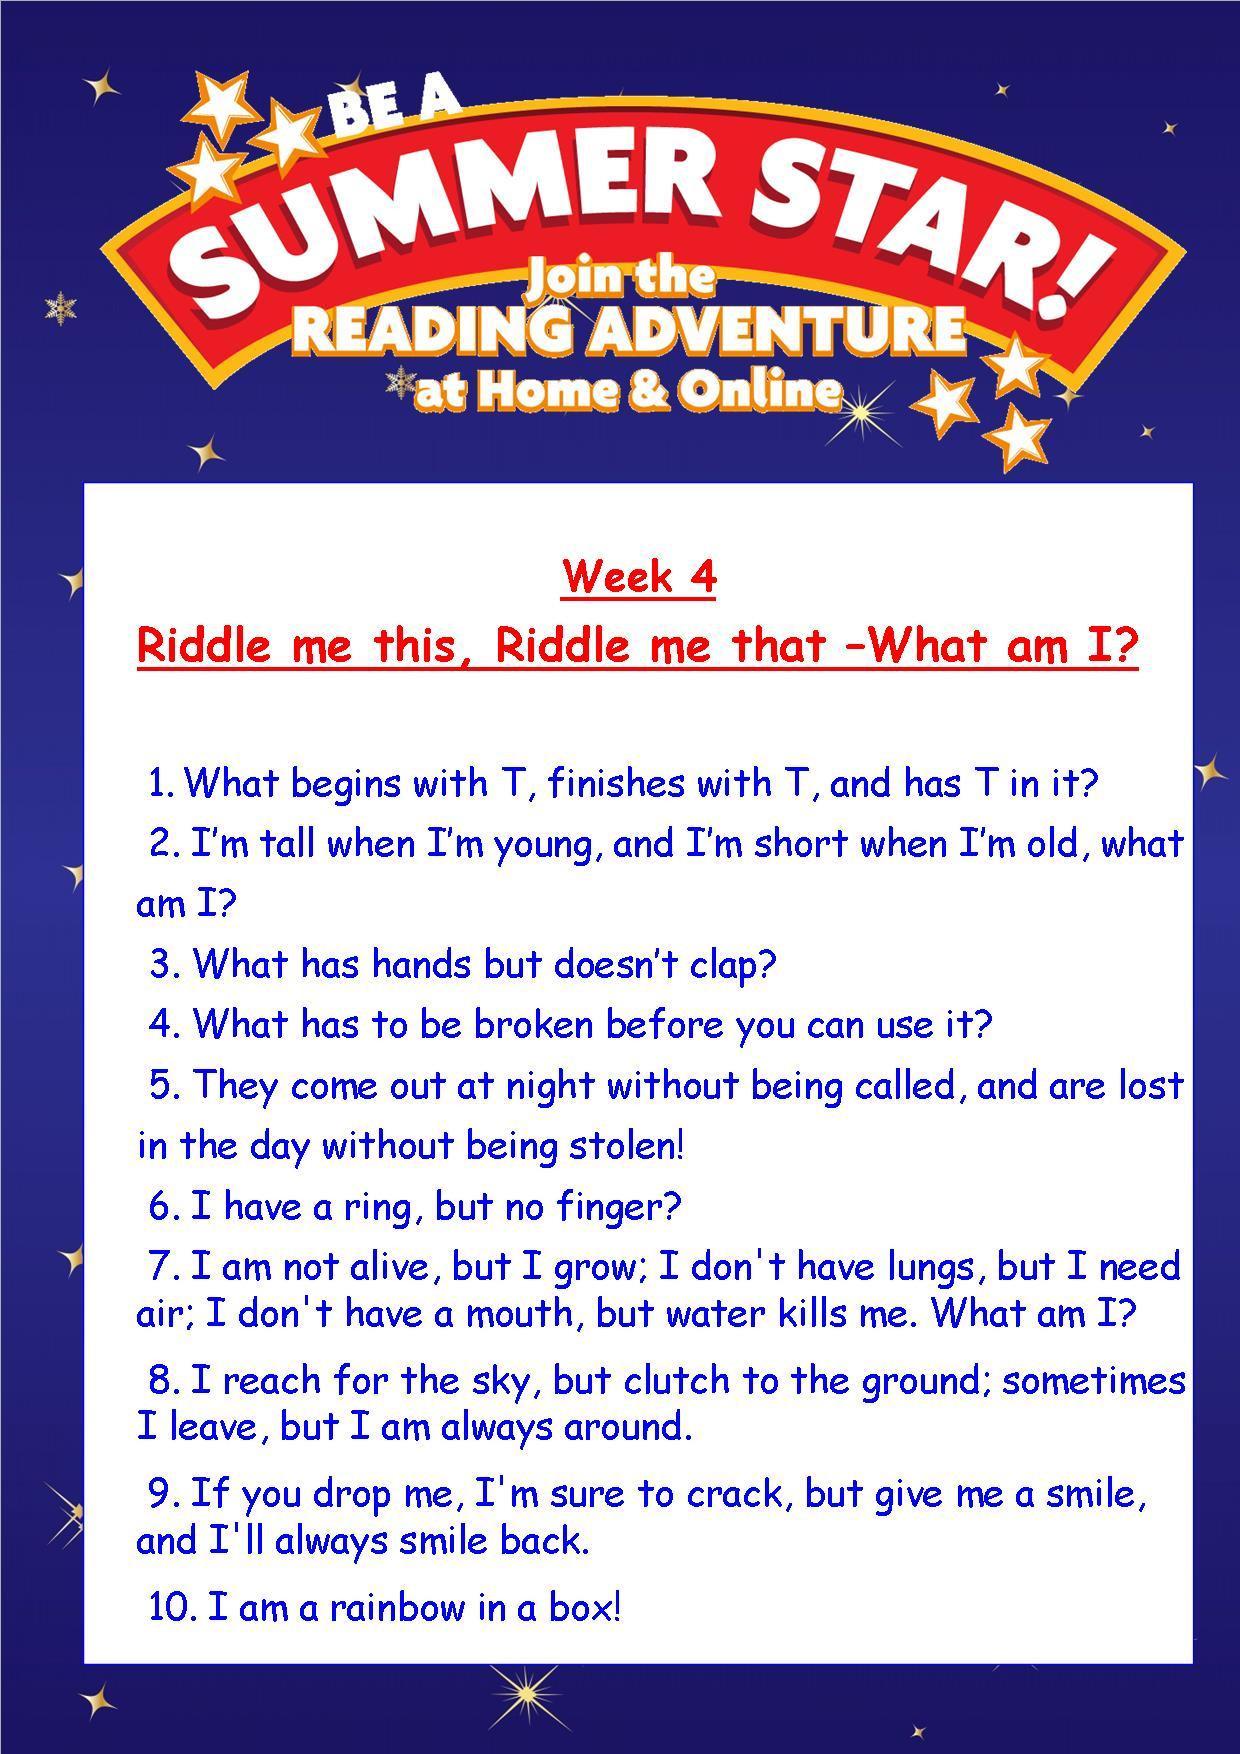 Thurles Library's Summer Stars Quiz – Week 4